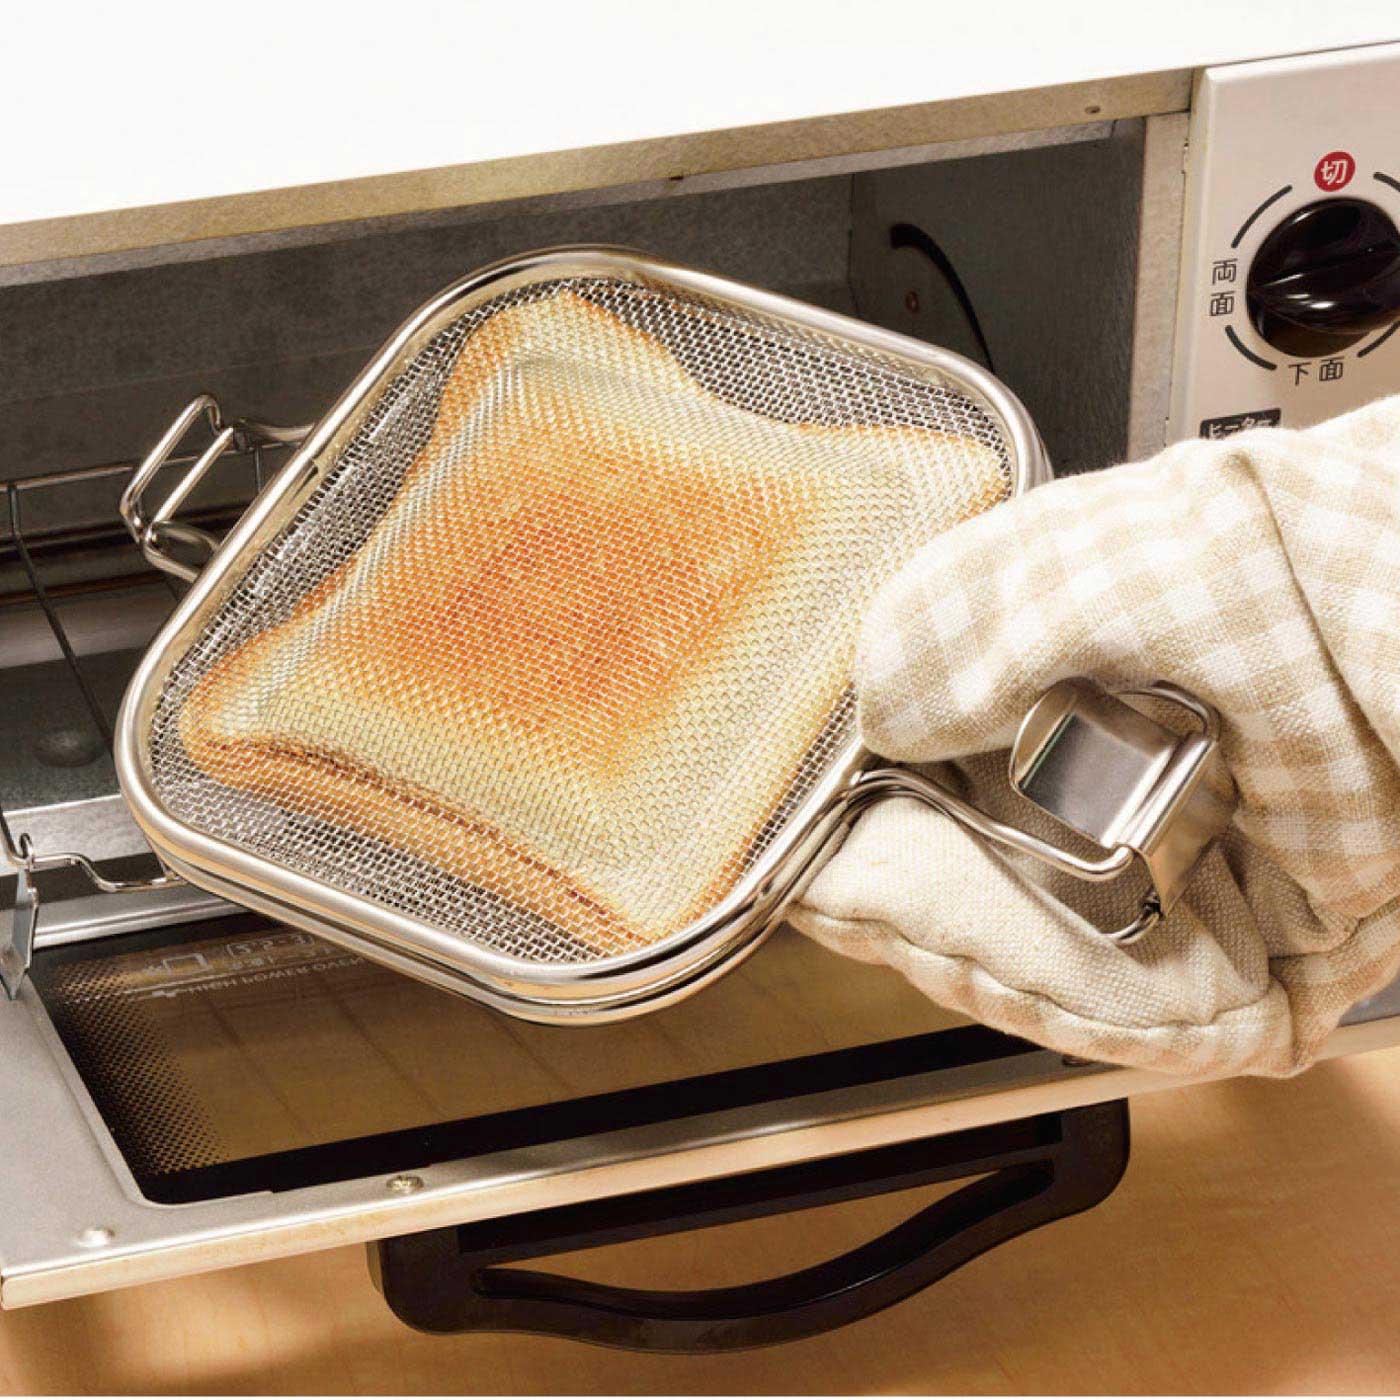 HOW TO USE② オーブントースターで焼くだけ。